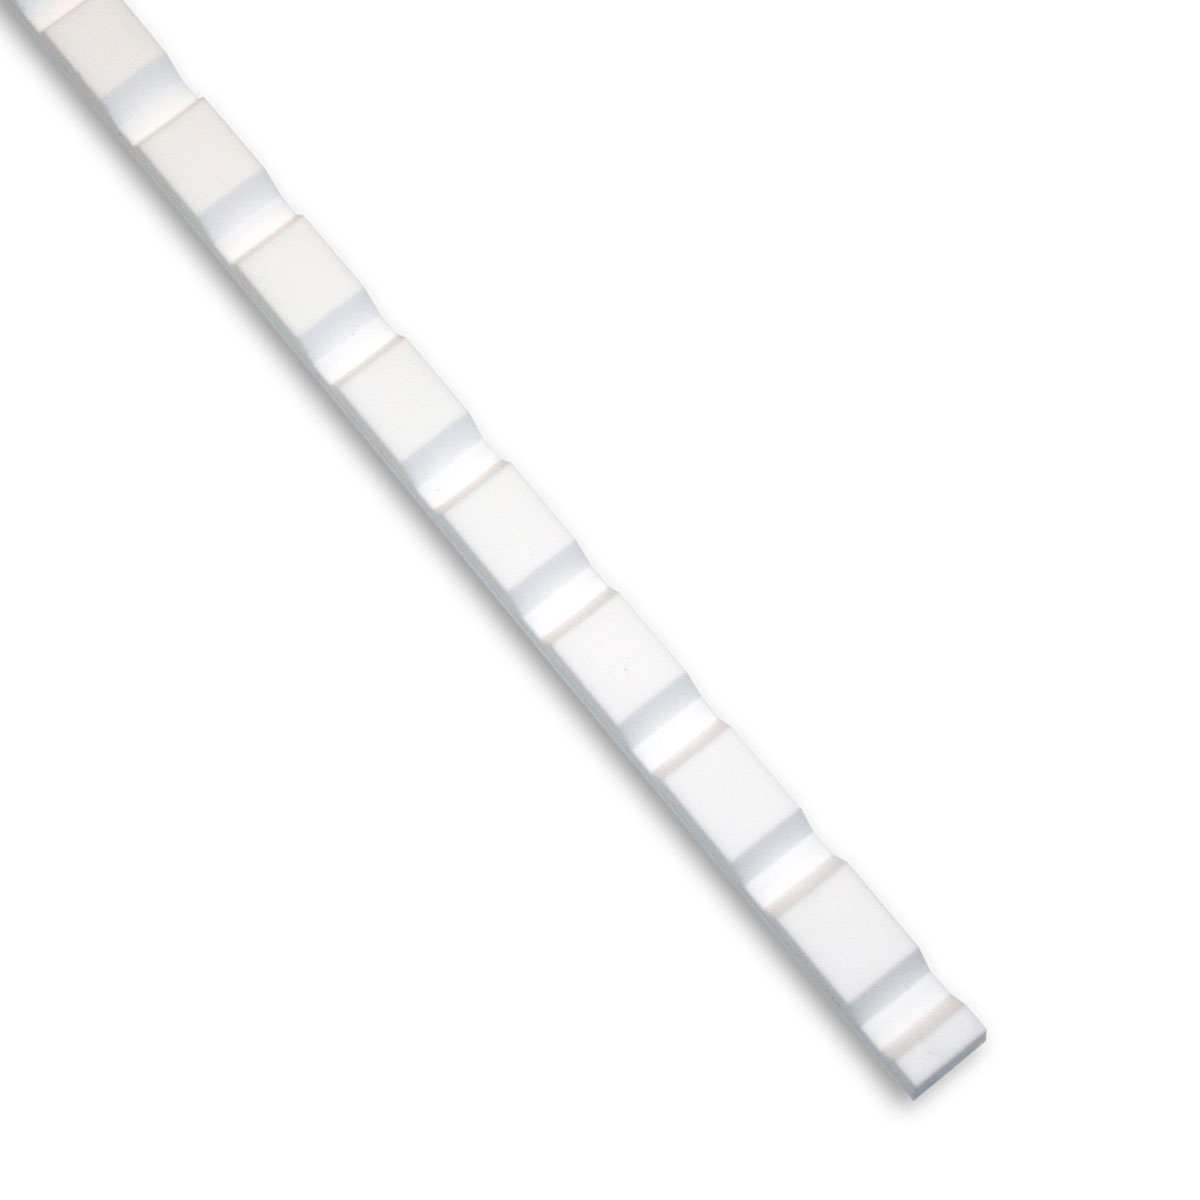 teflon strip with grooves horizontal heatsoakframe